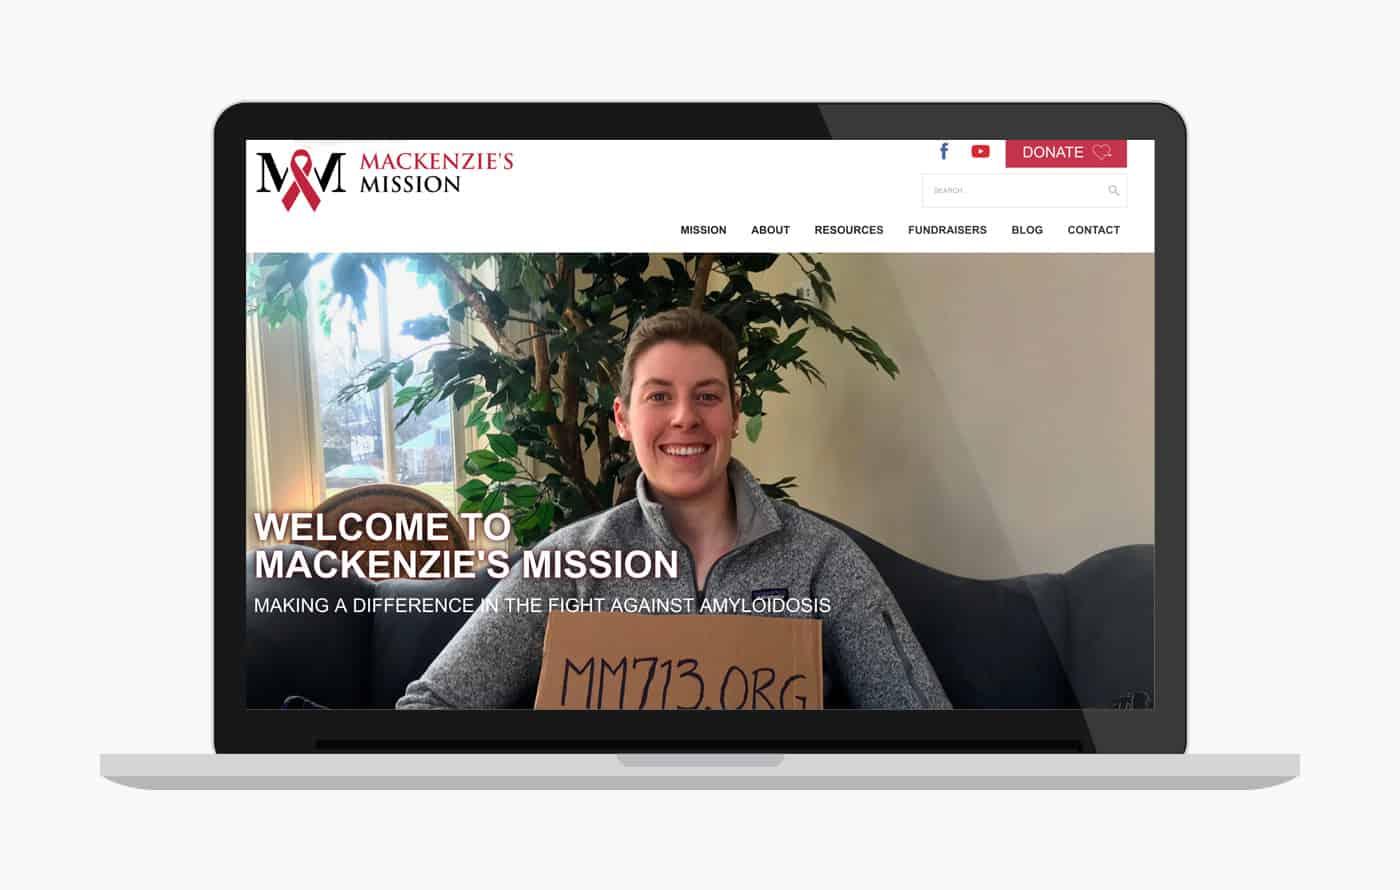 Mackenzie's Mission Nonprofit Web Design